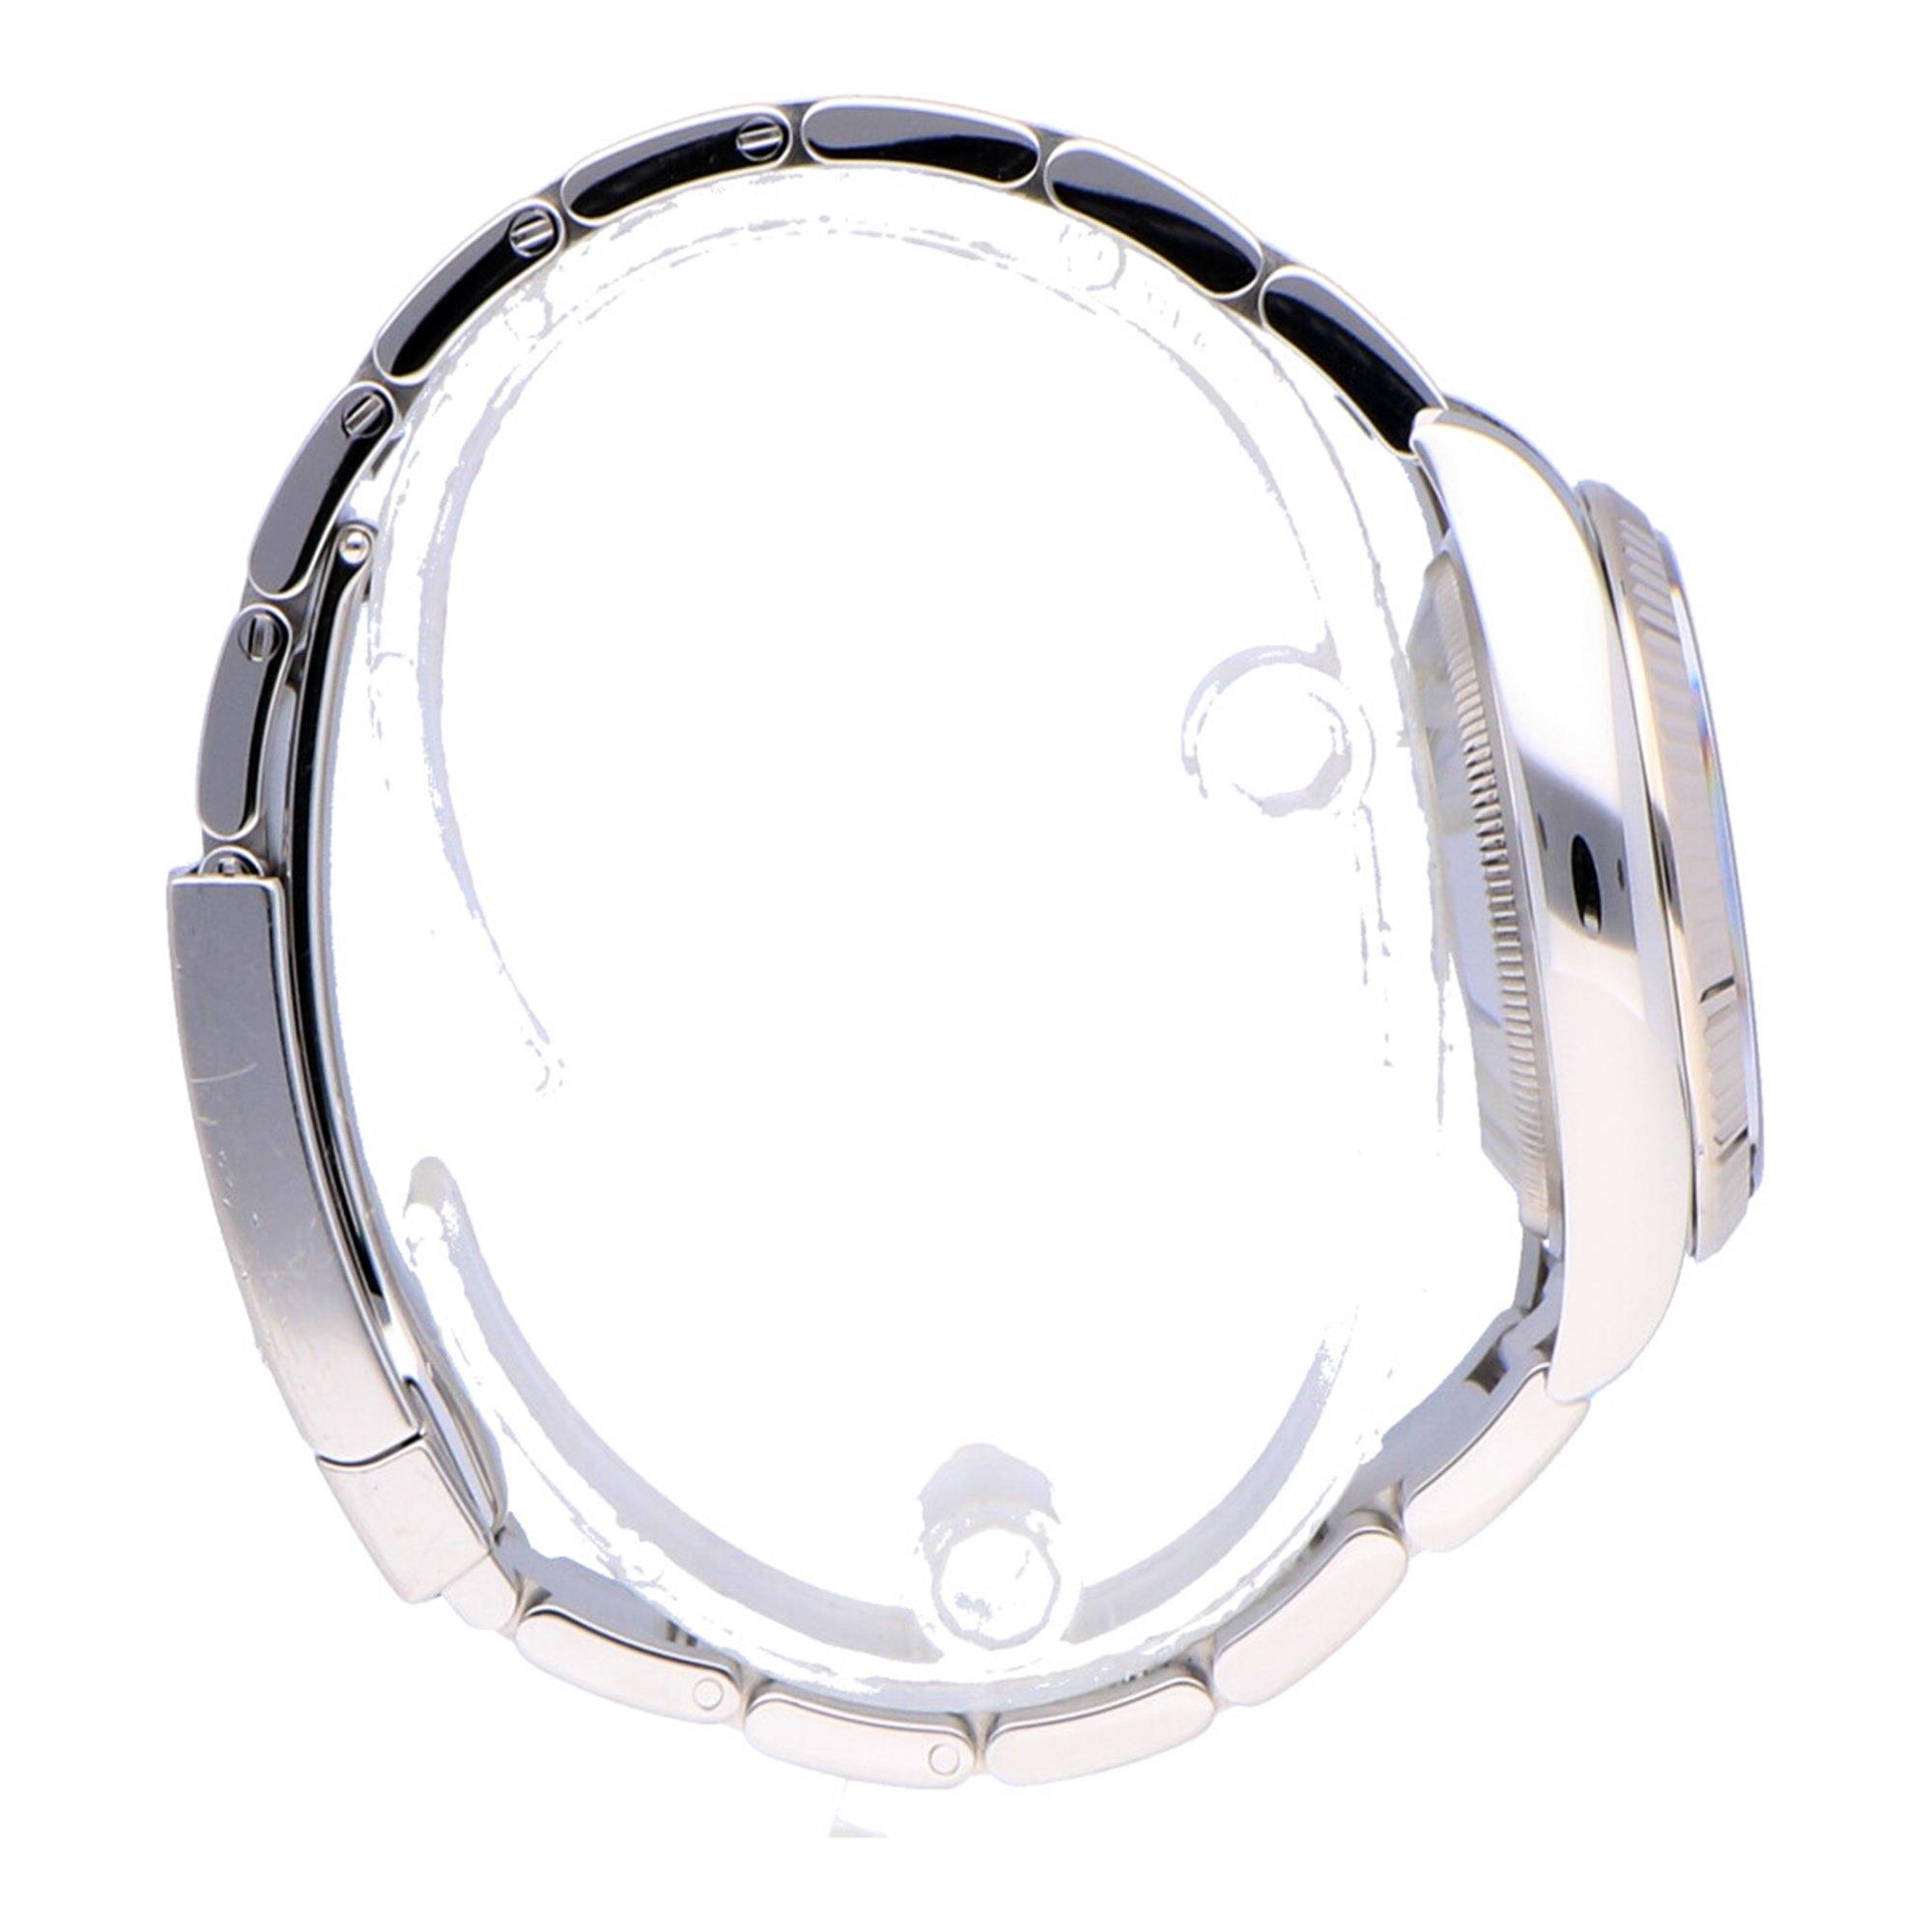 Rolex Datejust Stainless Steel 115234